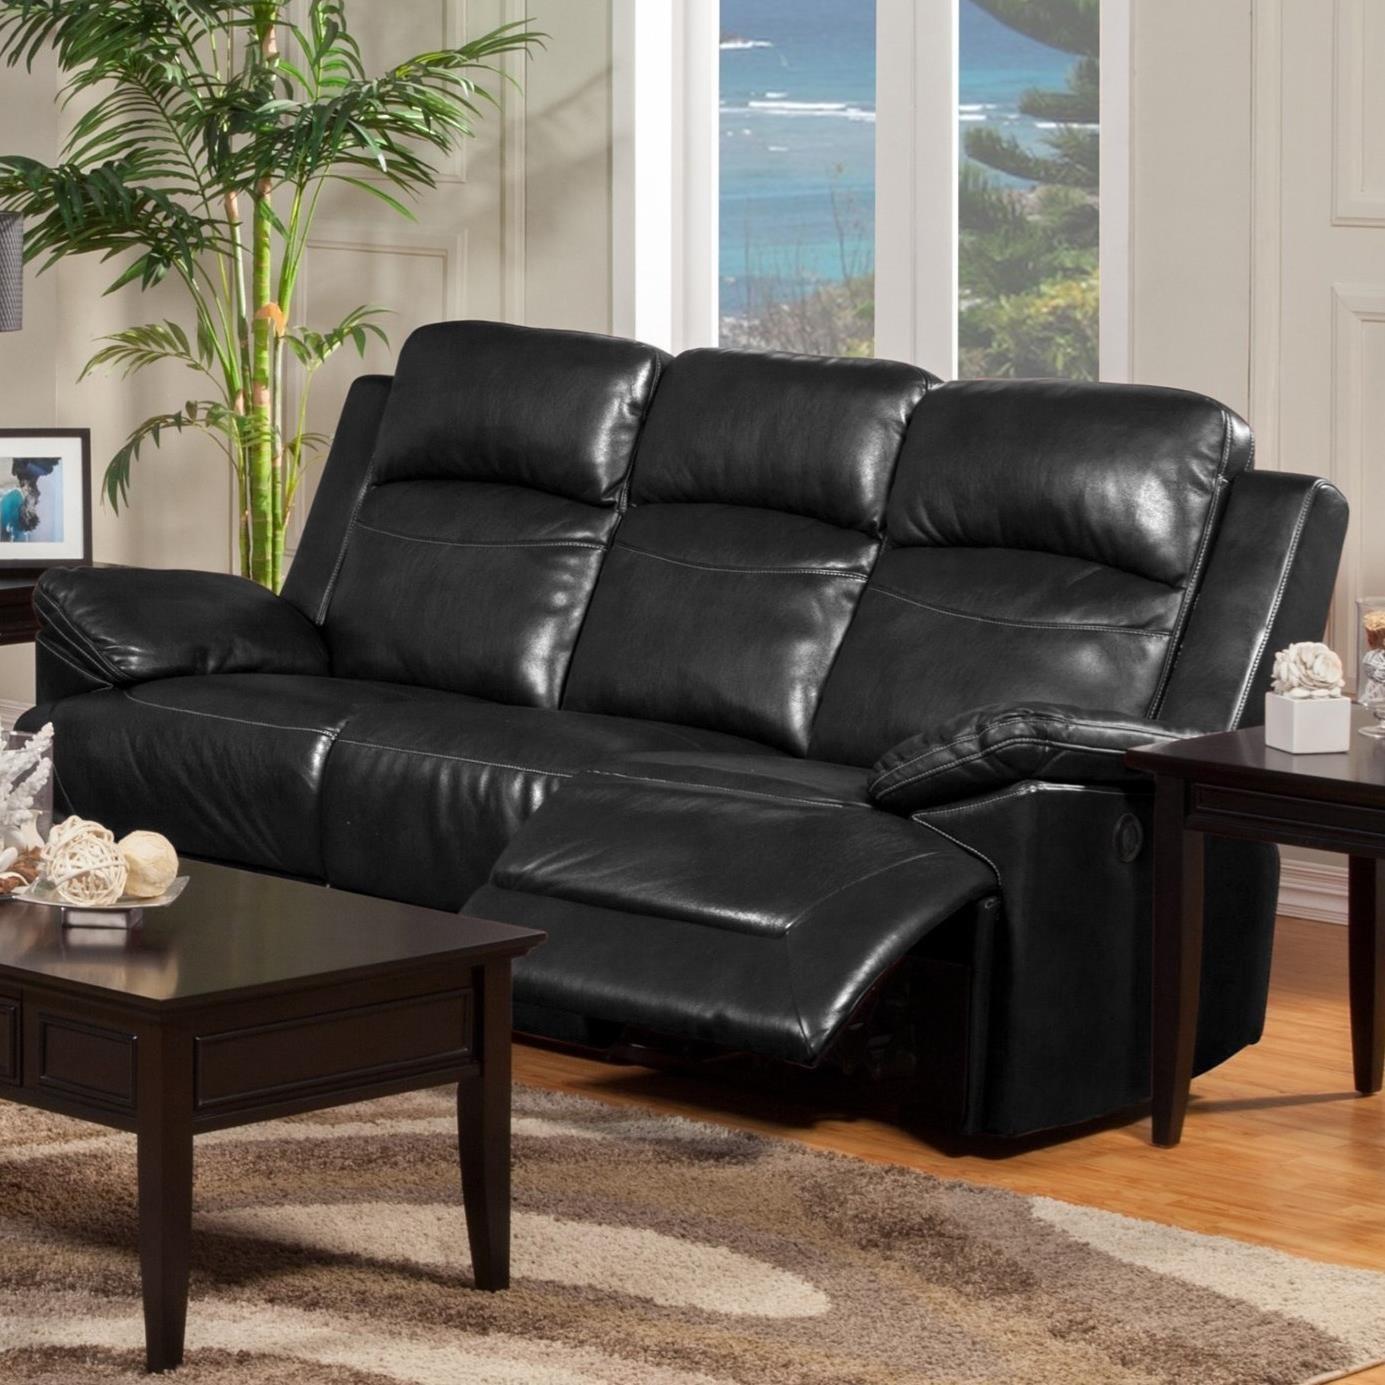 New Classic CortezDual Recliner Sofa